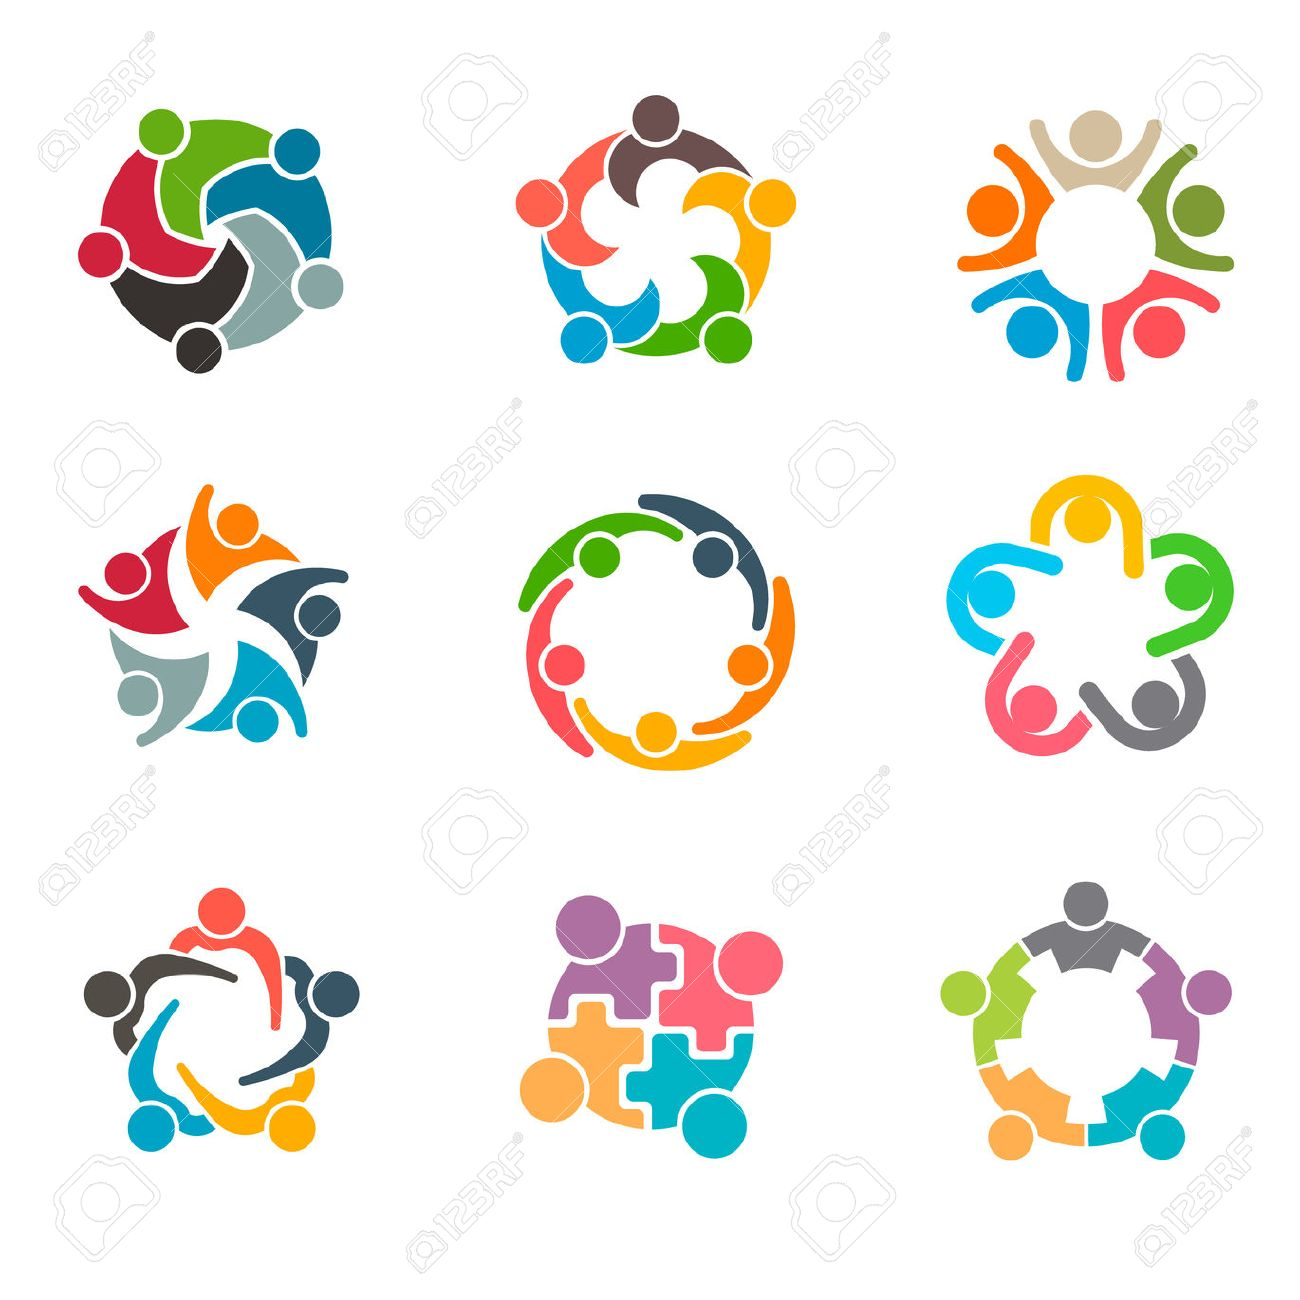 Set of Unusual People Group Teamwork Logo. Vector graphic design illustration - 61698305